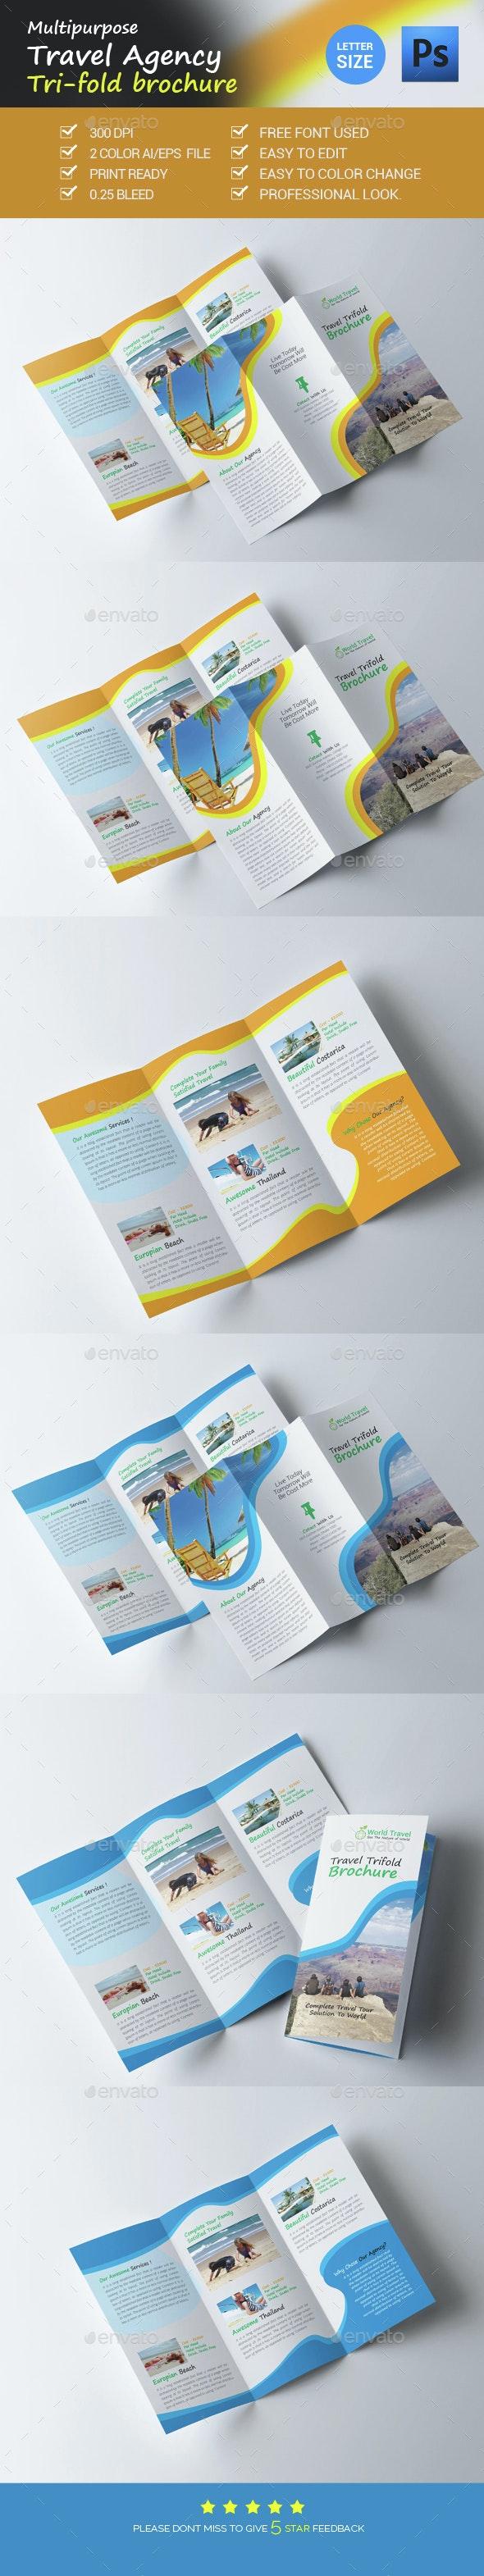 Travel Agency Trifold Brochure - Brochures Print Templates